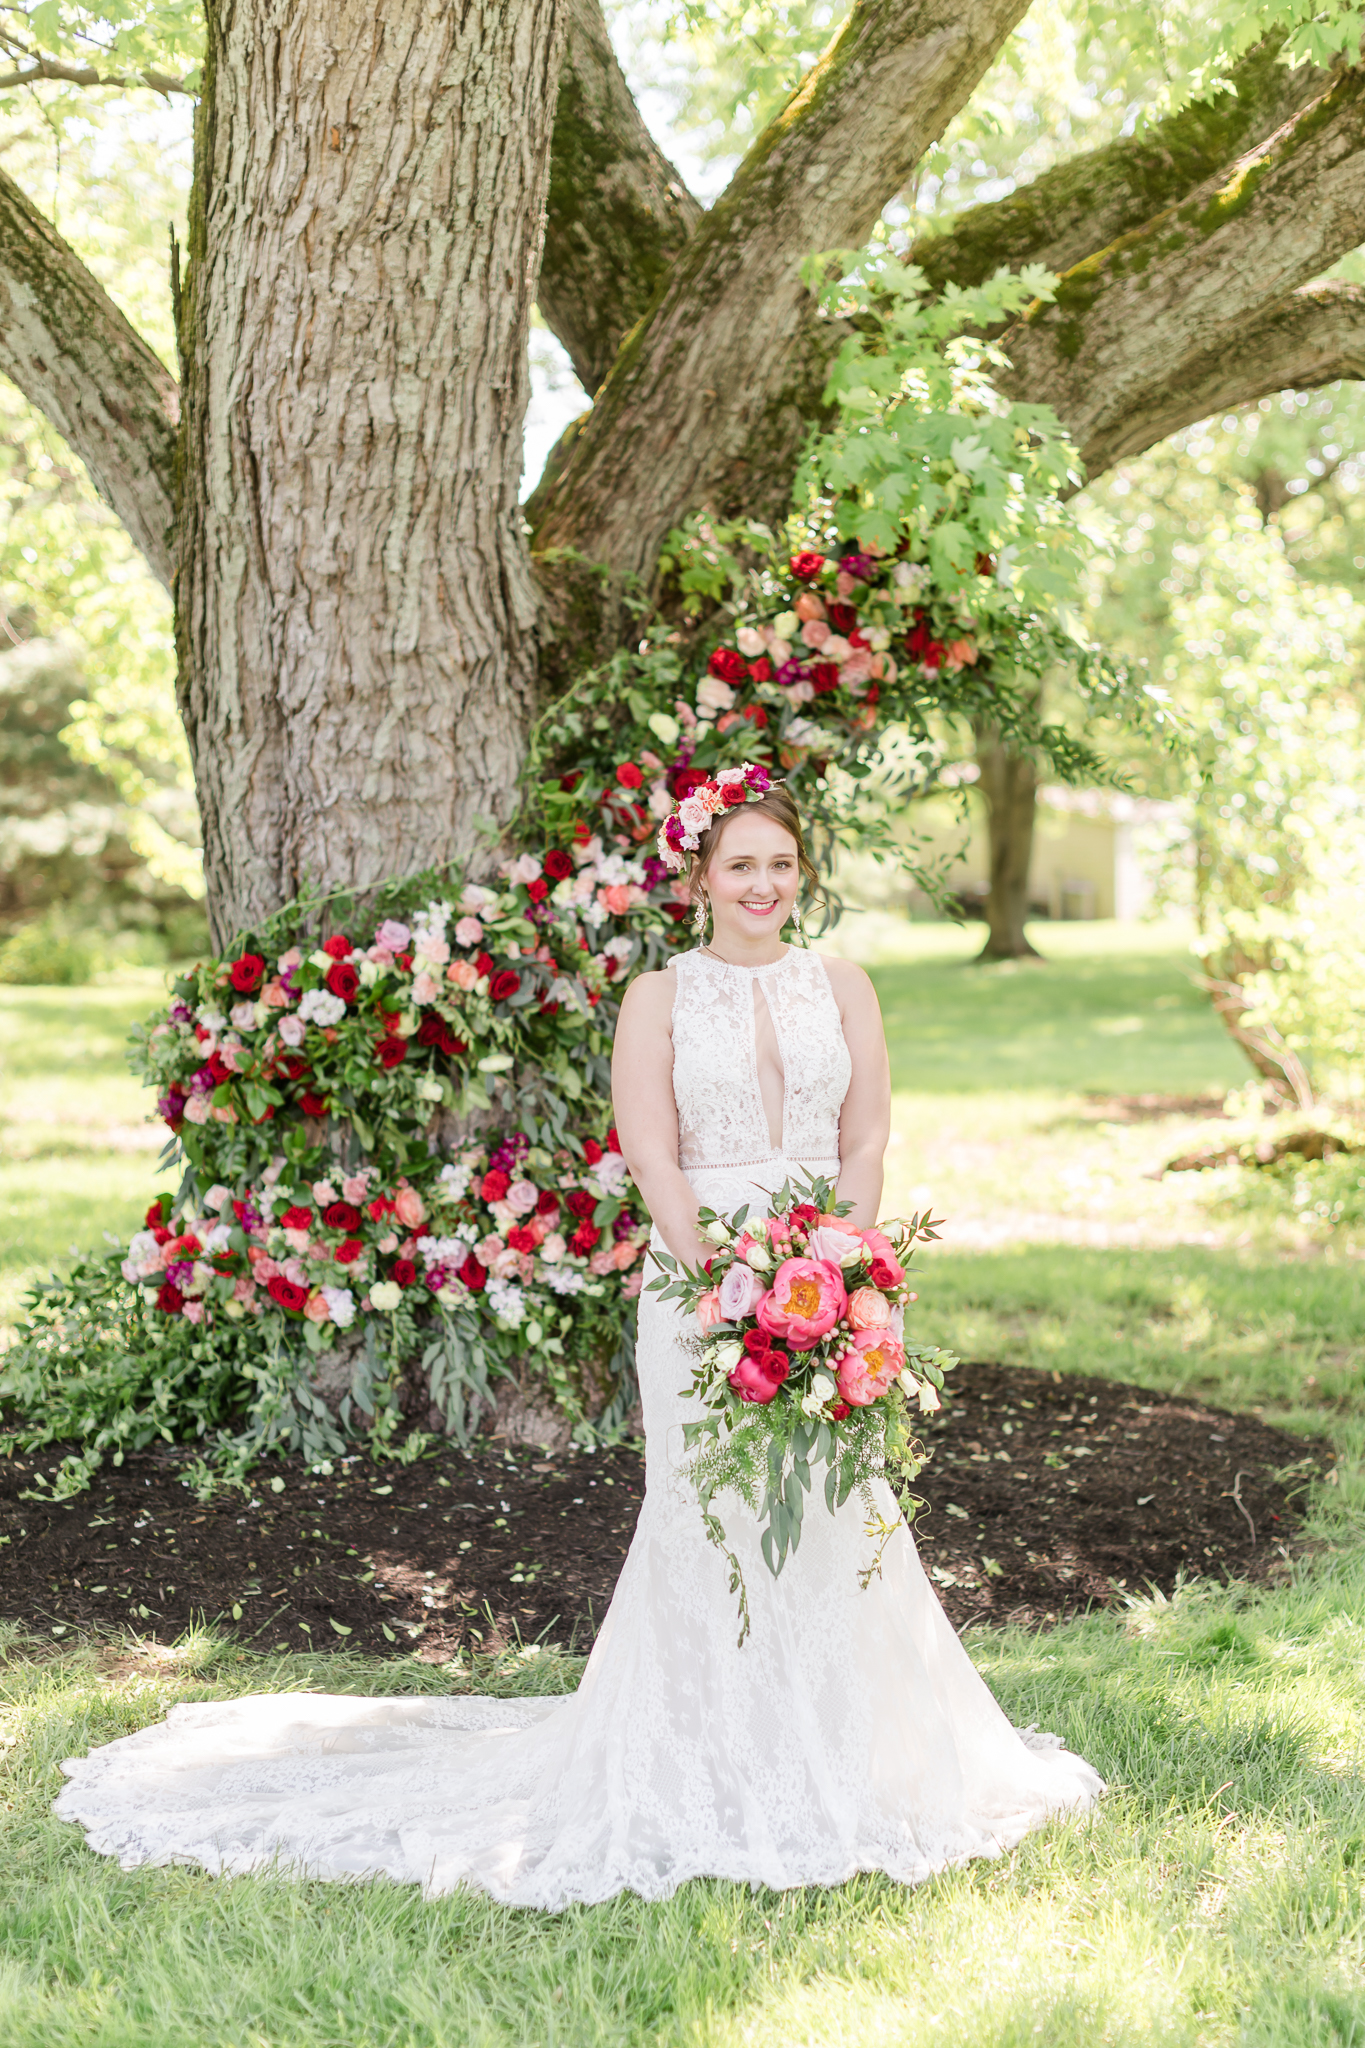 Mustard Seed Gardens Wedding Indianapolis Noblesvile Fishers Wedding Photographer-32.jpg